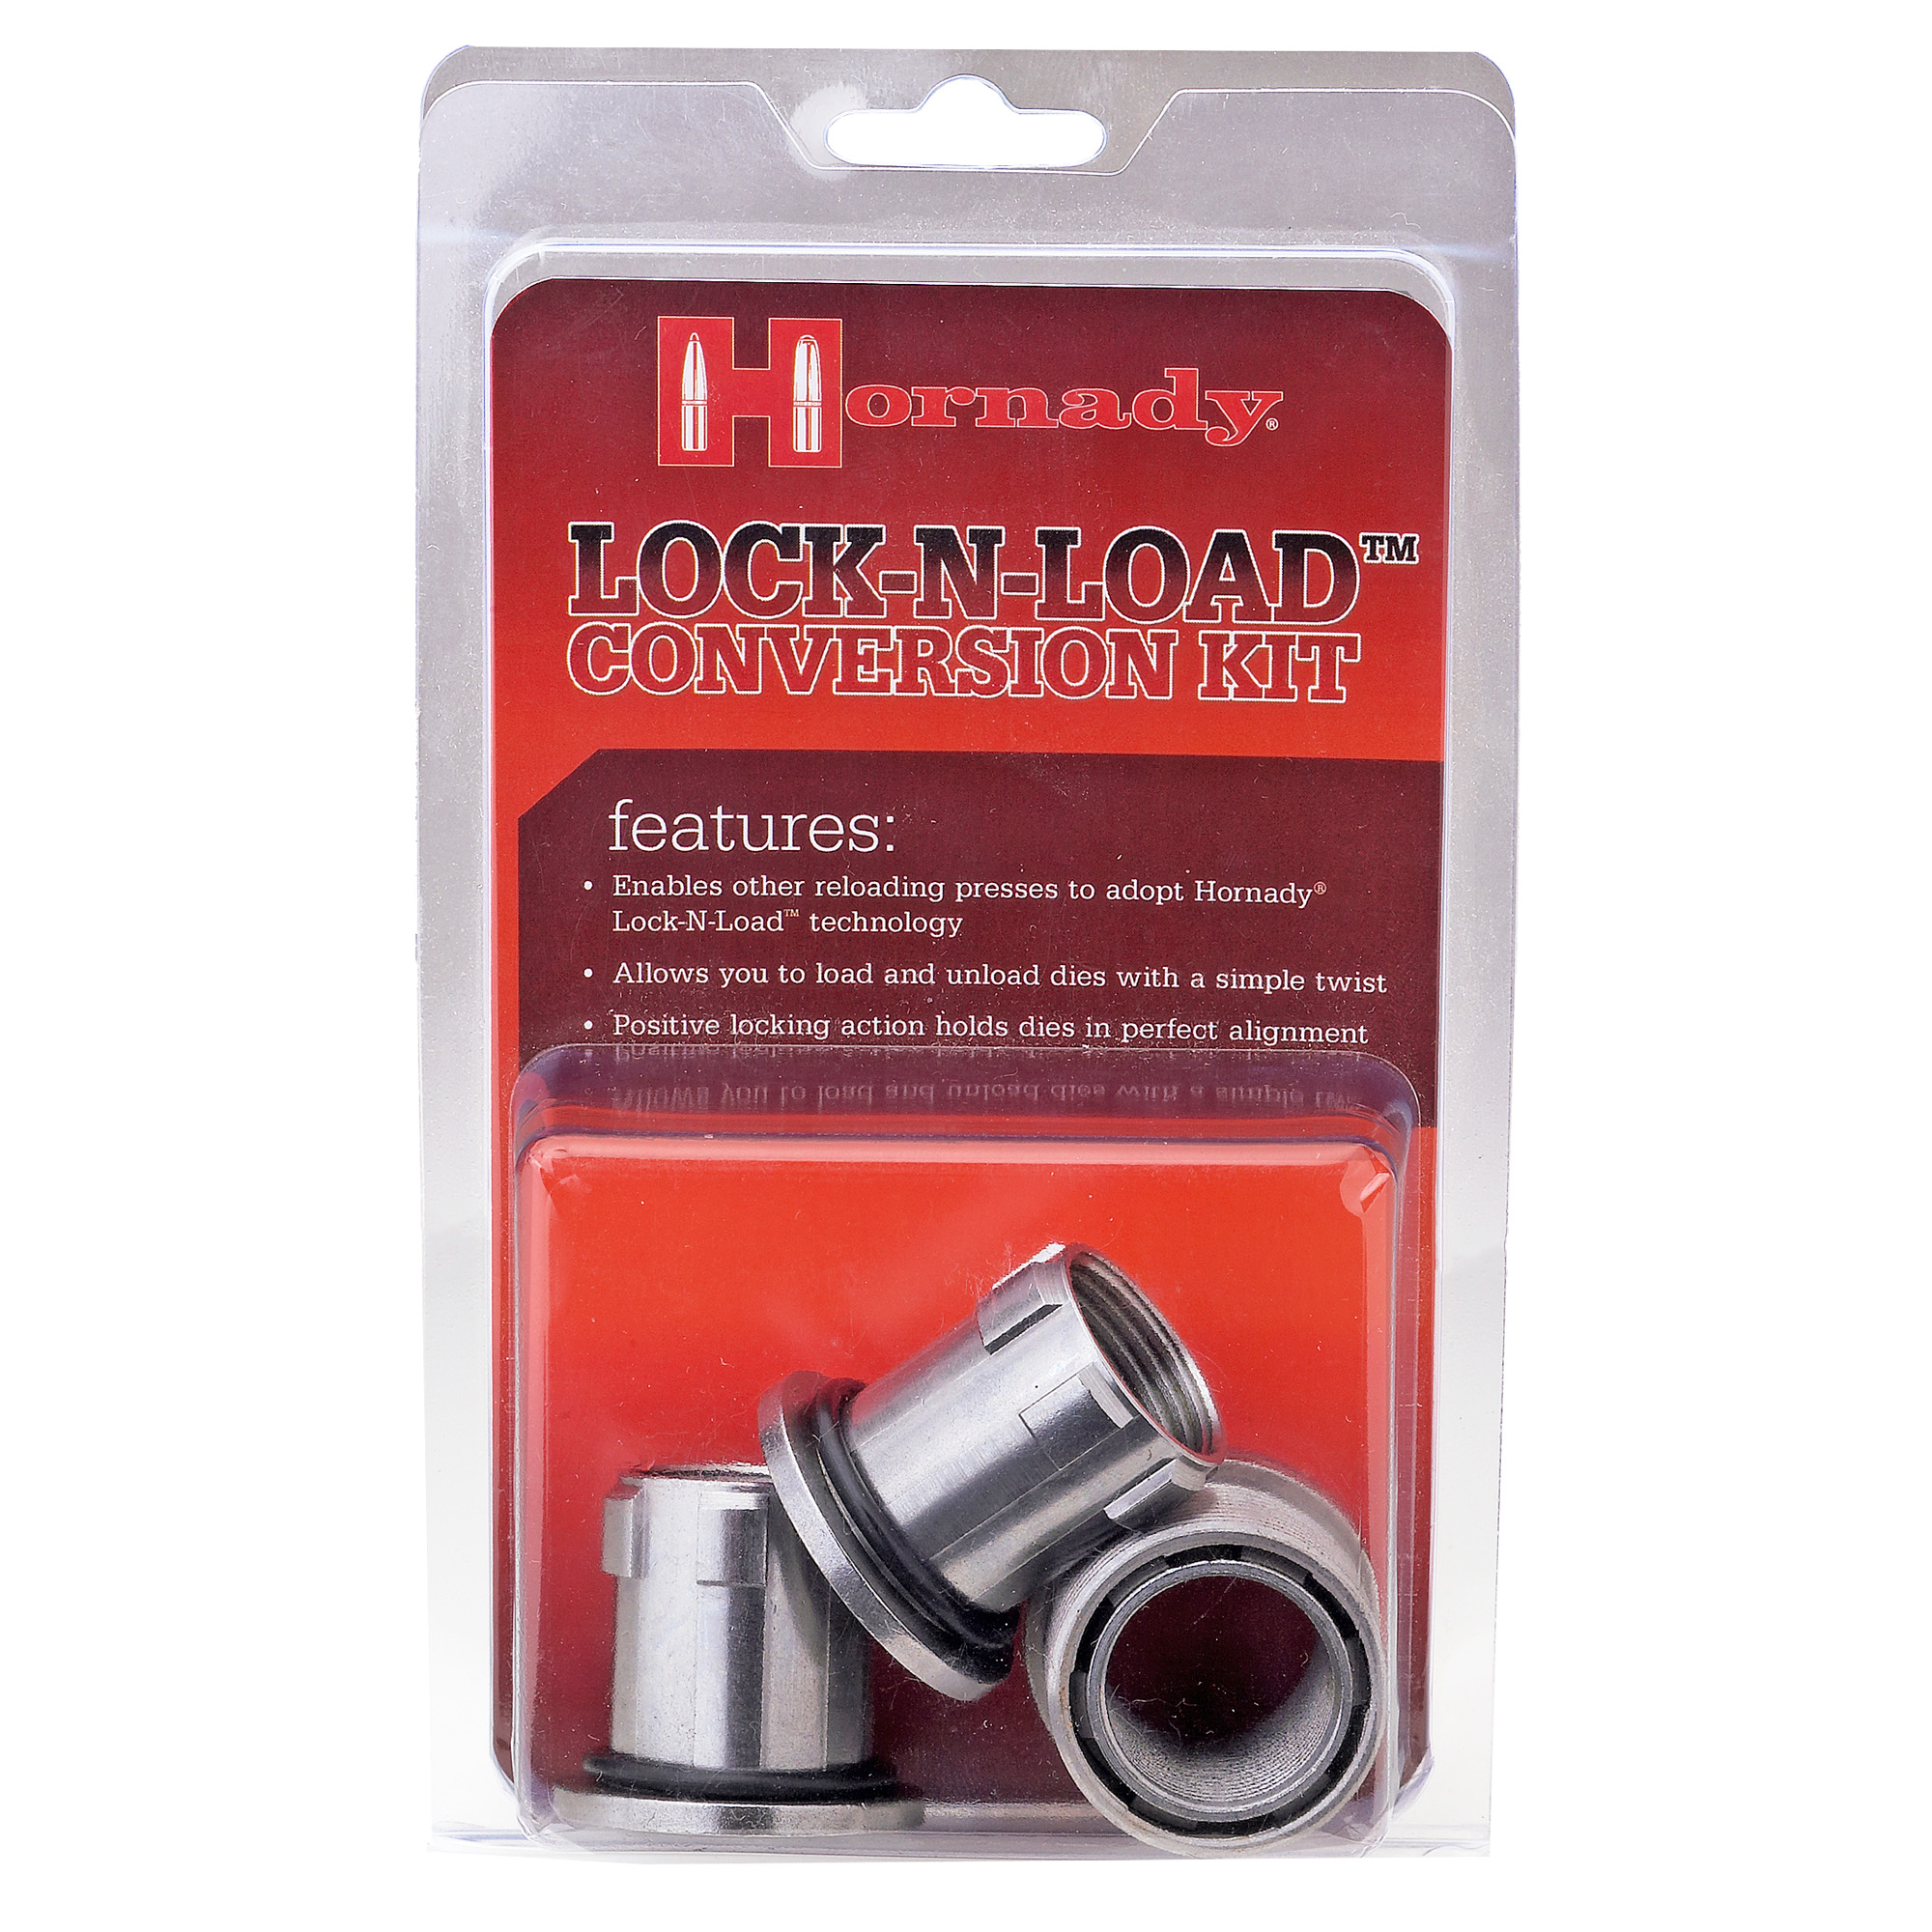 Hrndy Lock-n-load Conversion Kit